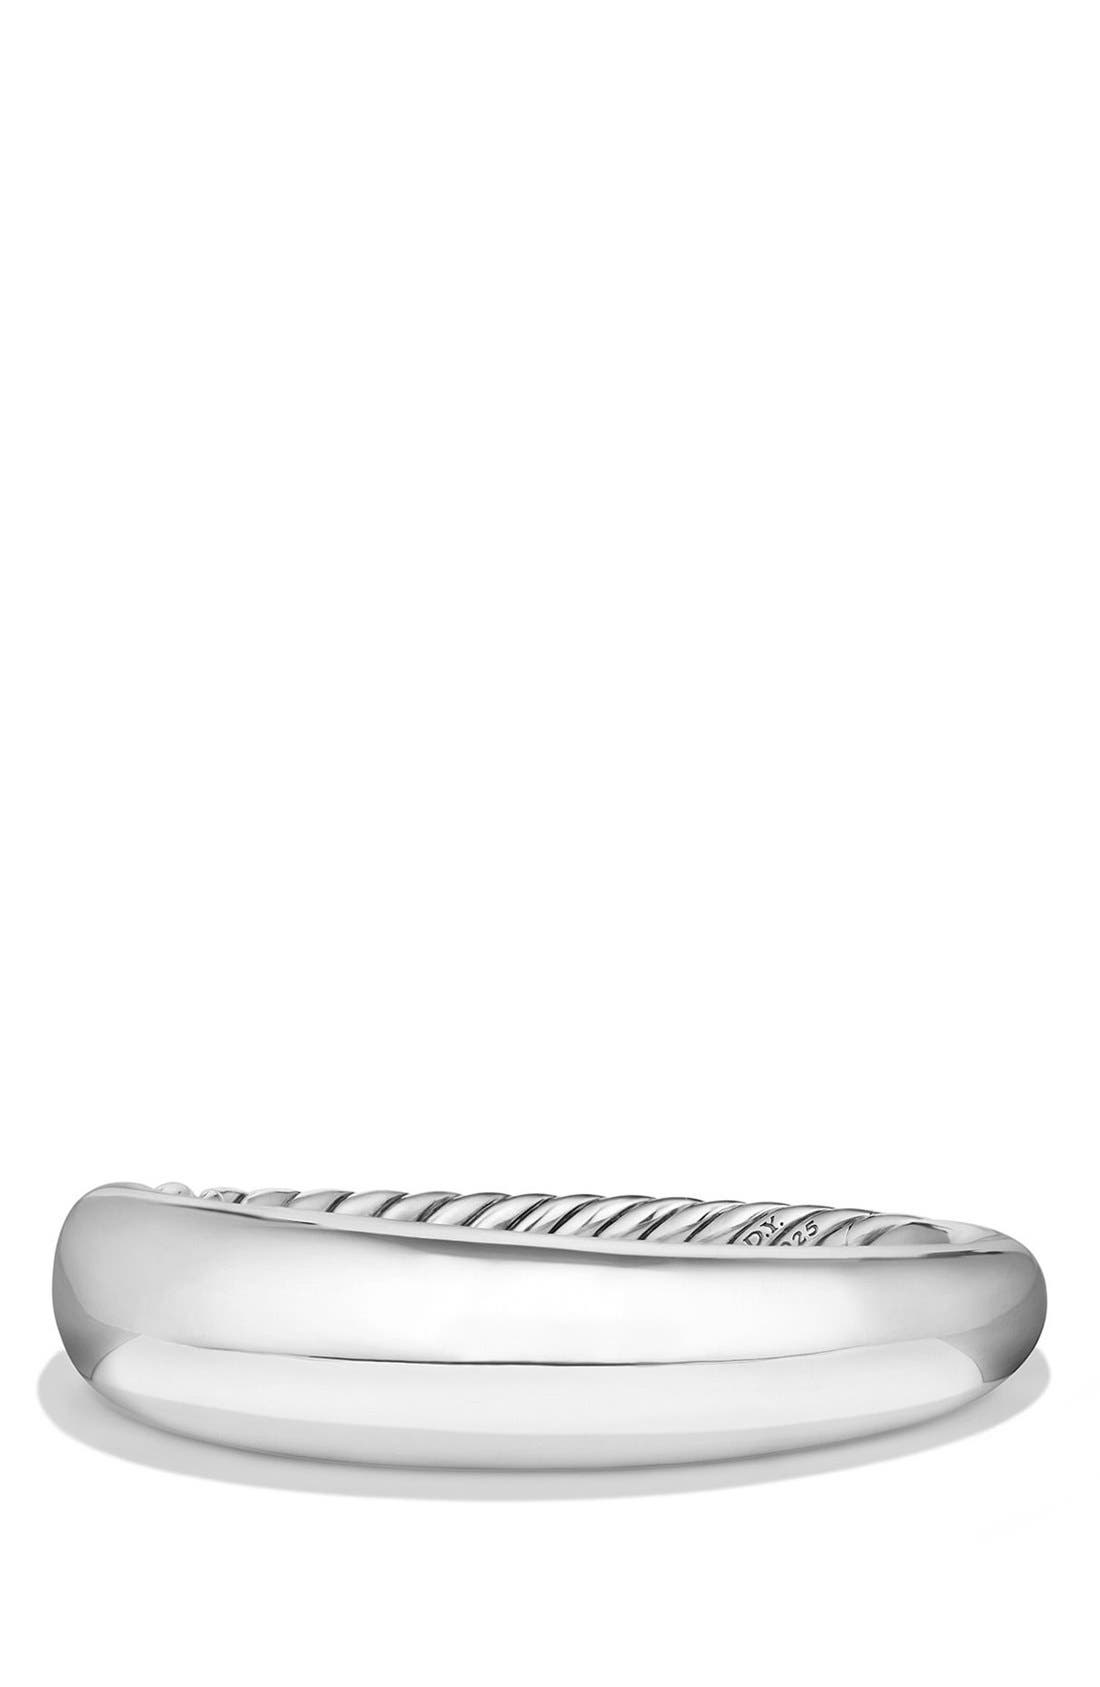 DAVID YURMAN Pure Form Large Sterling Silver Bracelet